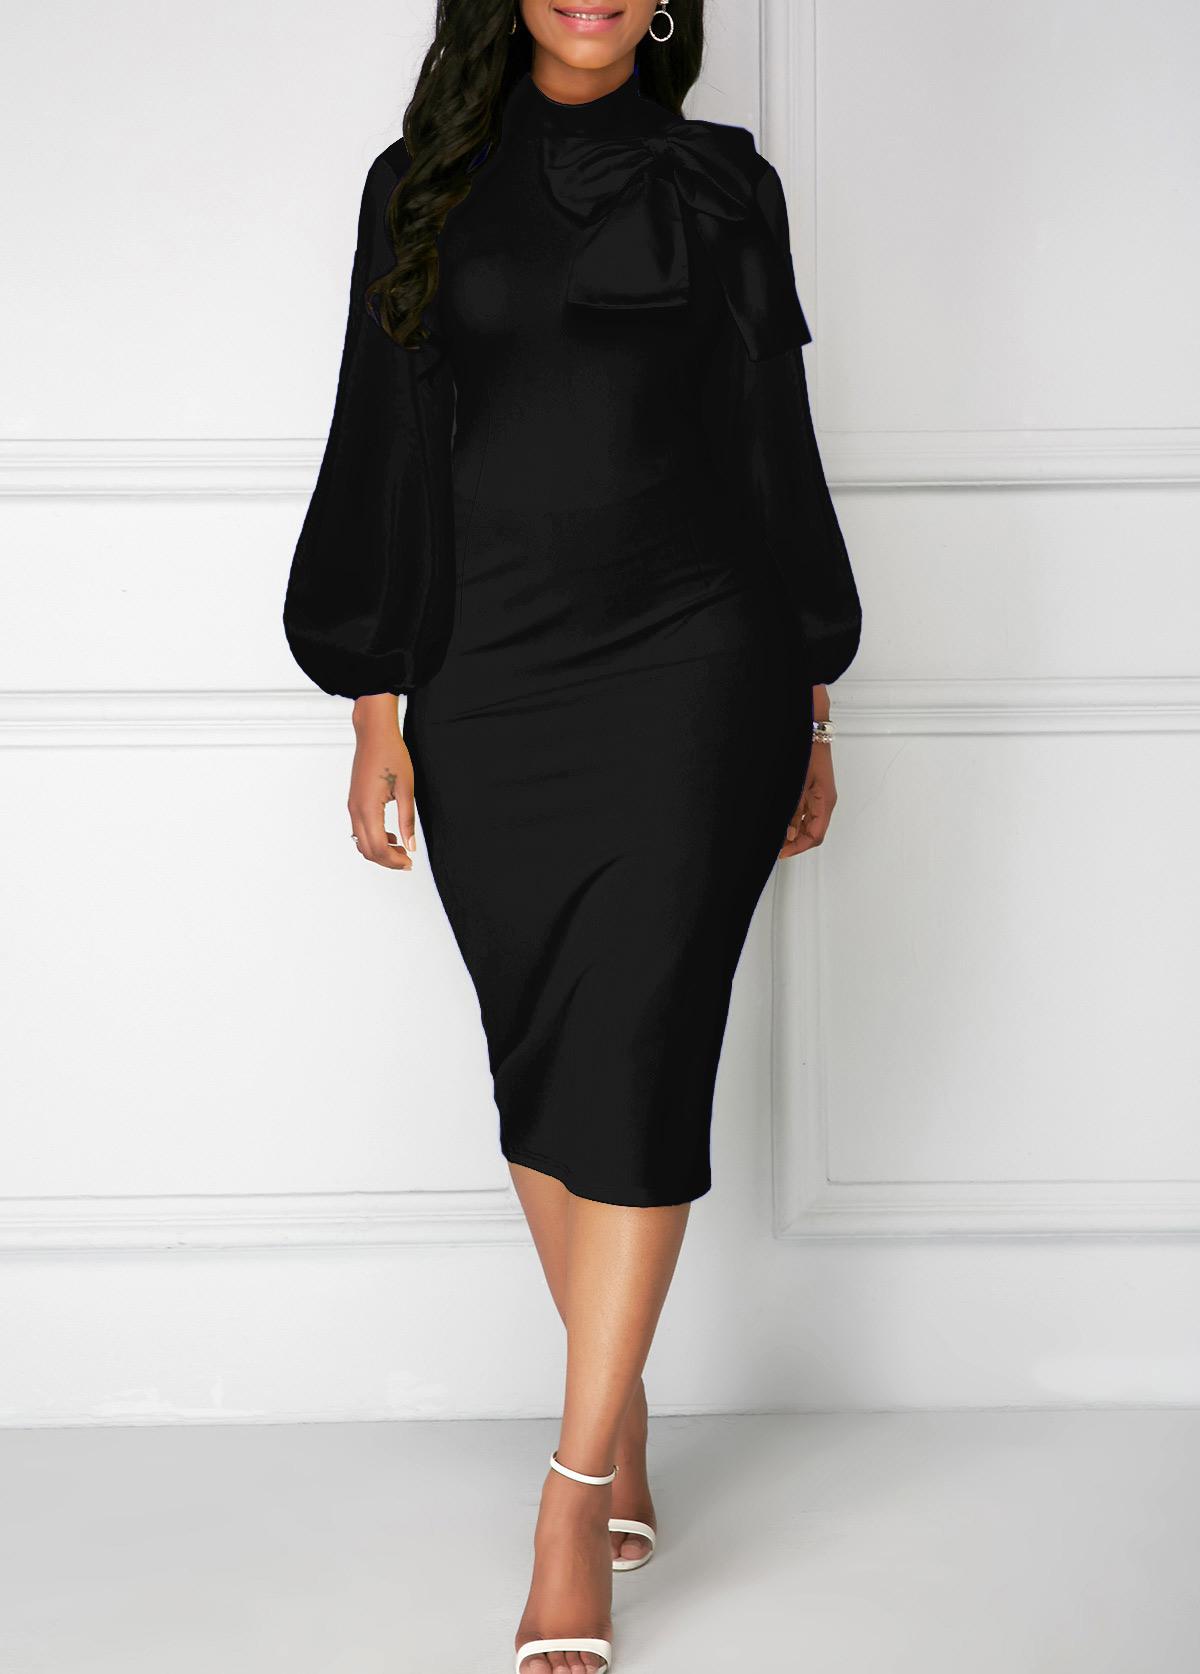 Bowknot Neck Black Lantern Sleeve Sheath Dress